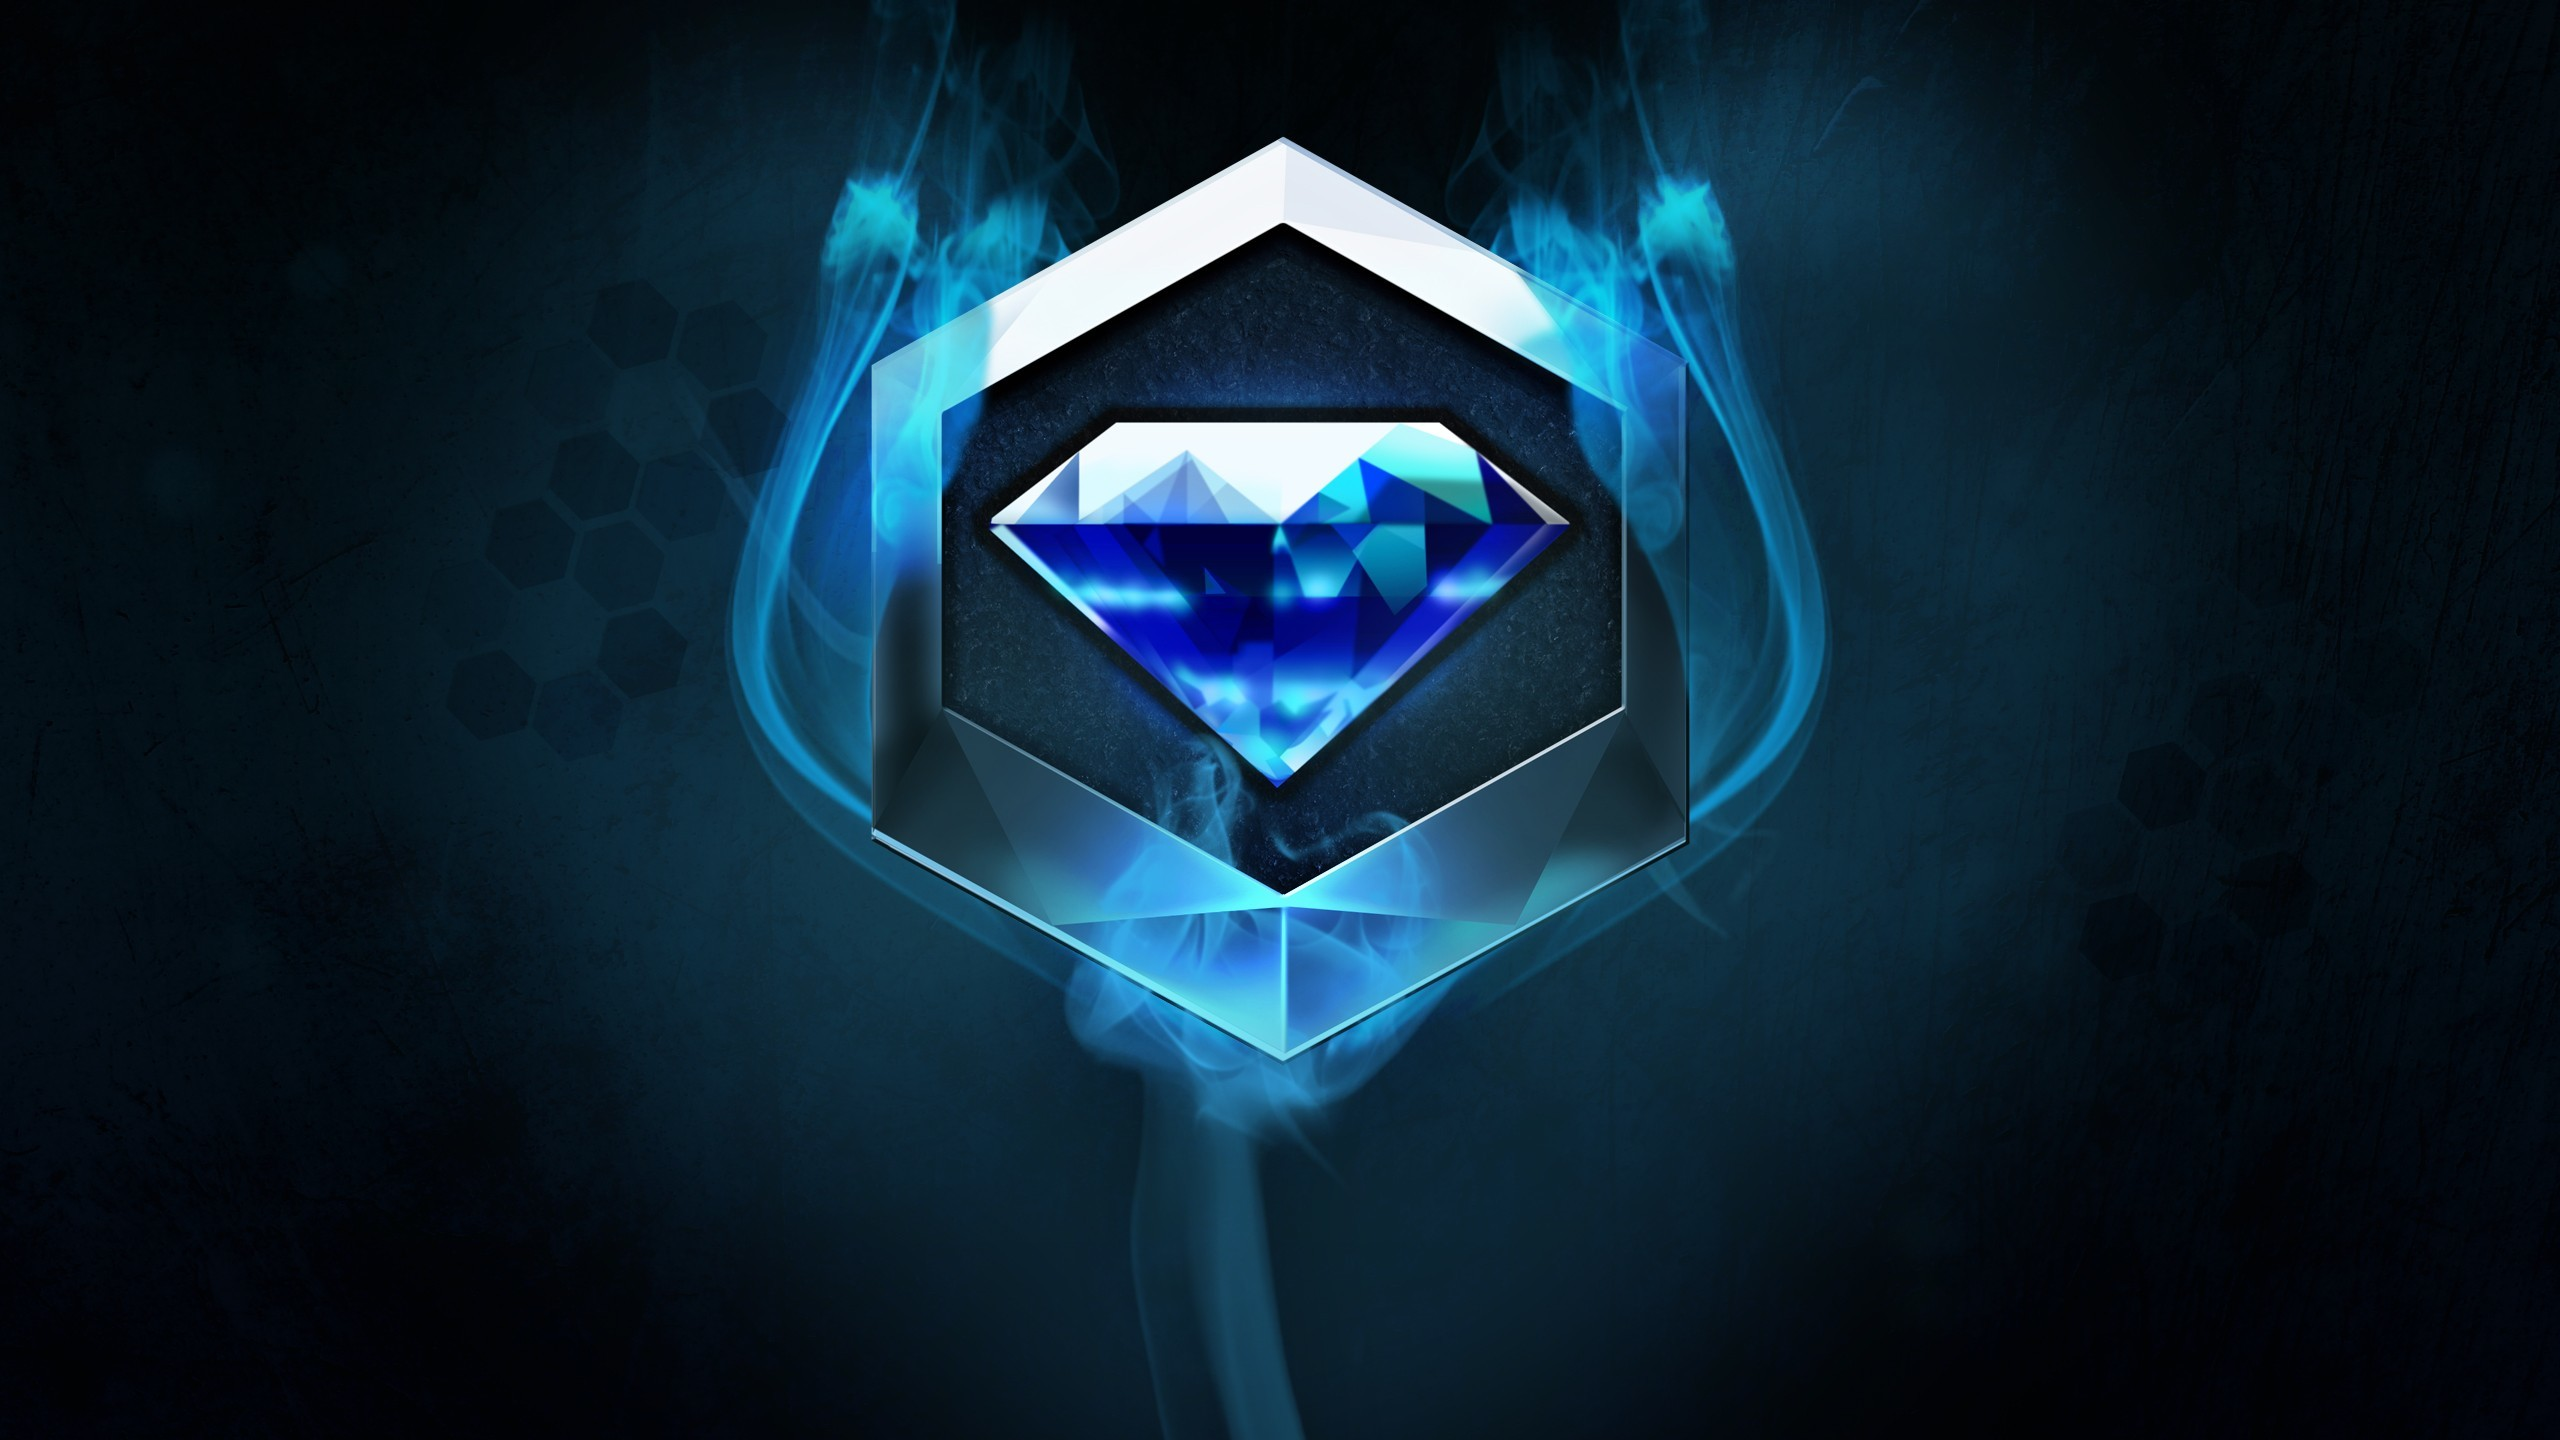 Enderman Diamond Minecraft Wallpaper